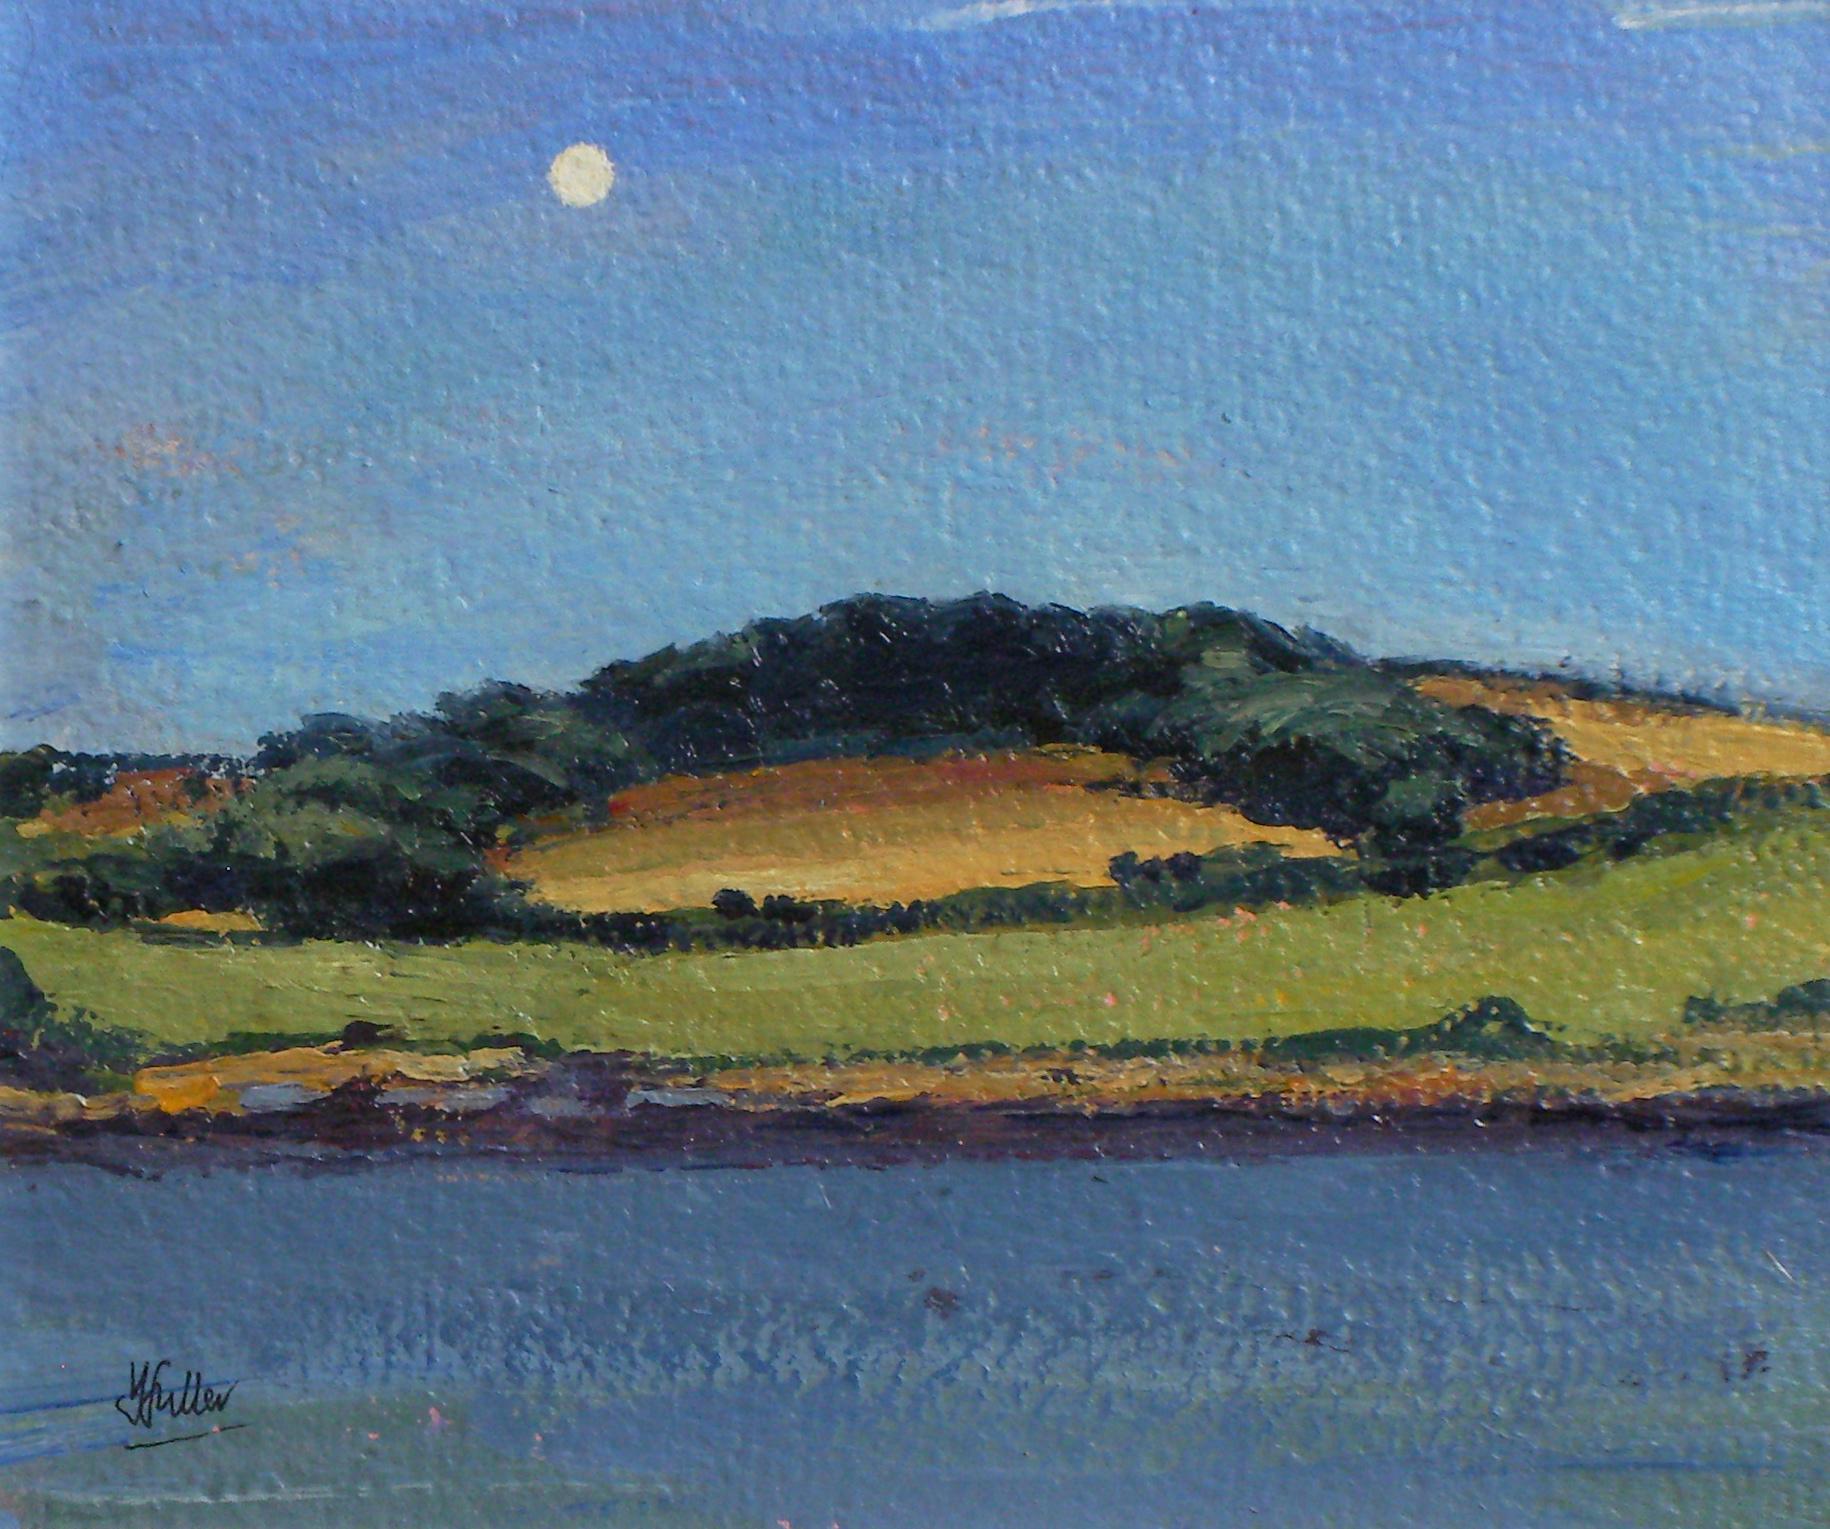 672 Summer moonrise, Carricknath